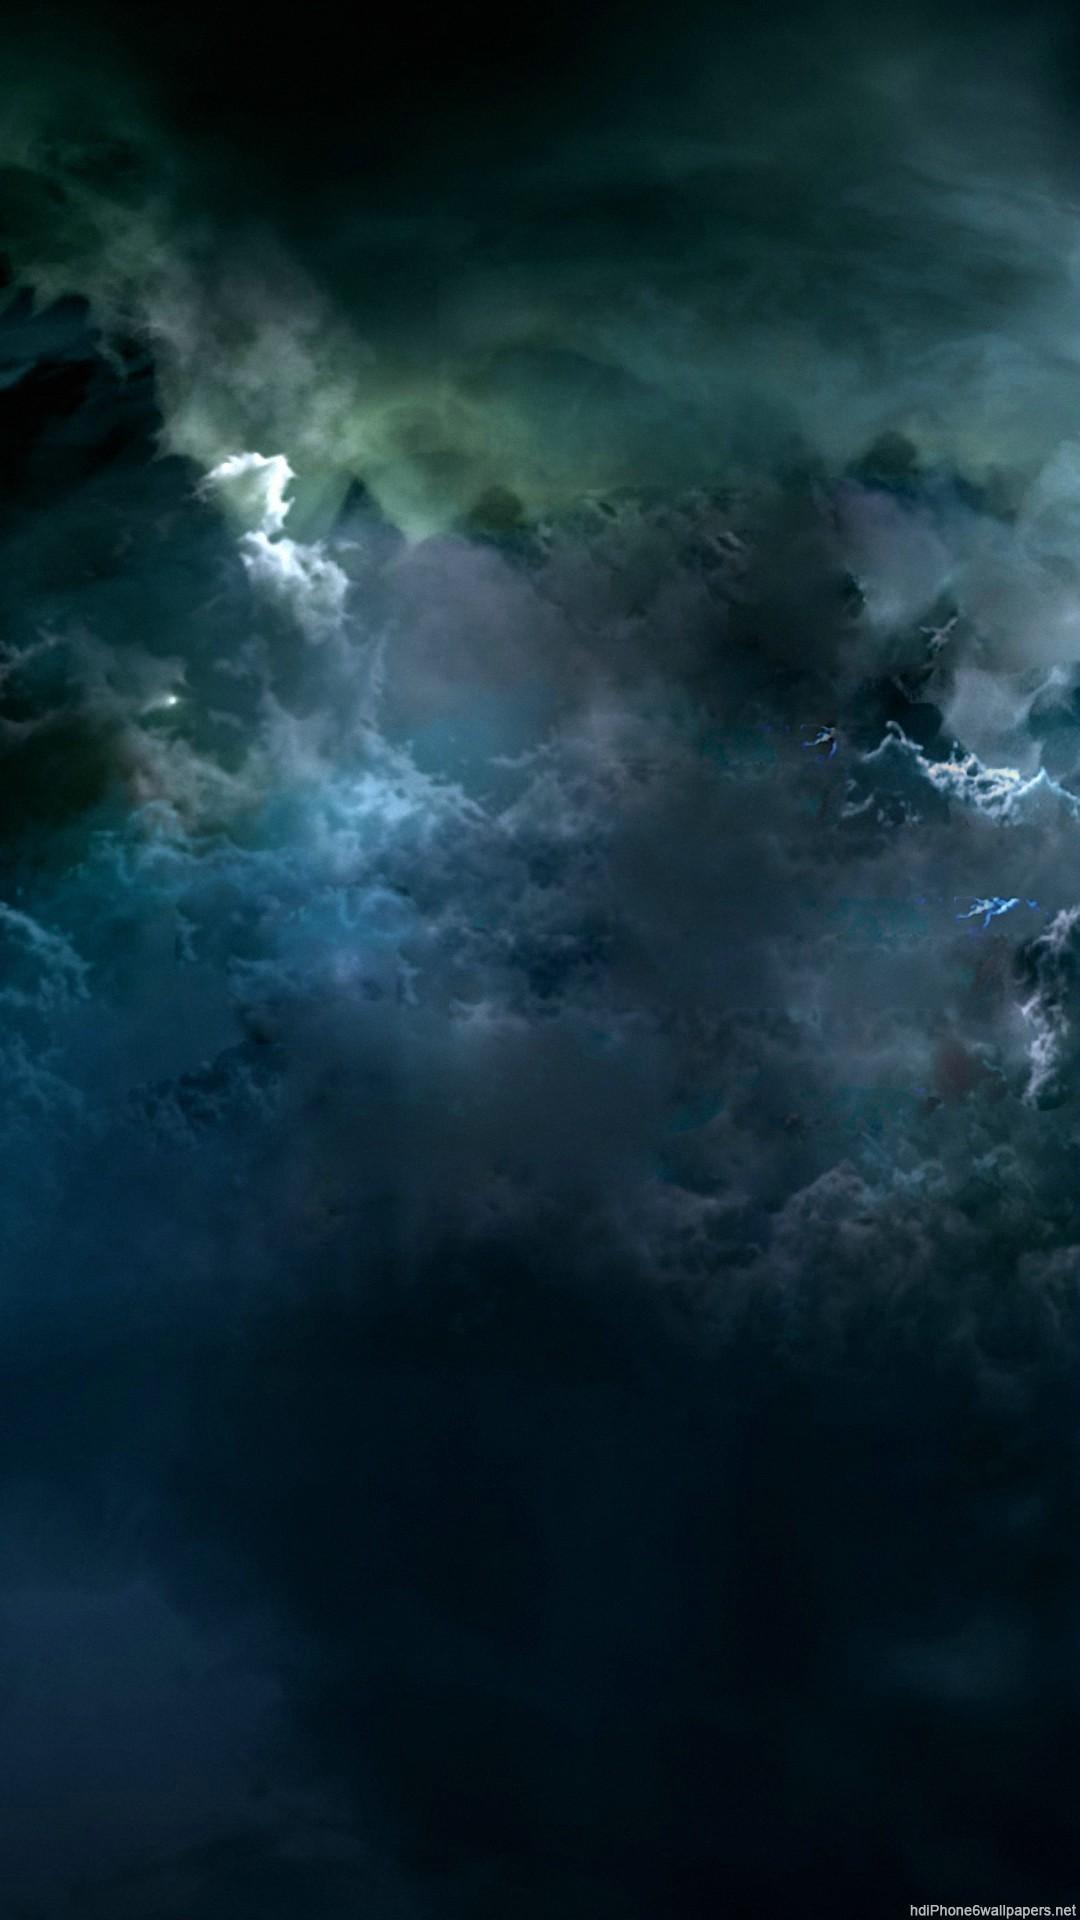 Res: 1080x1920, 1920x1200 Dark Clouds Night Time